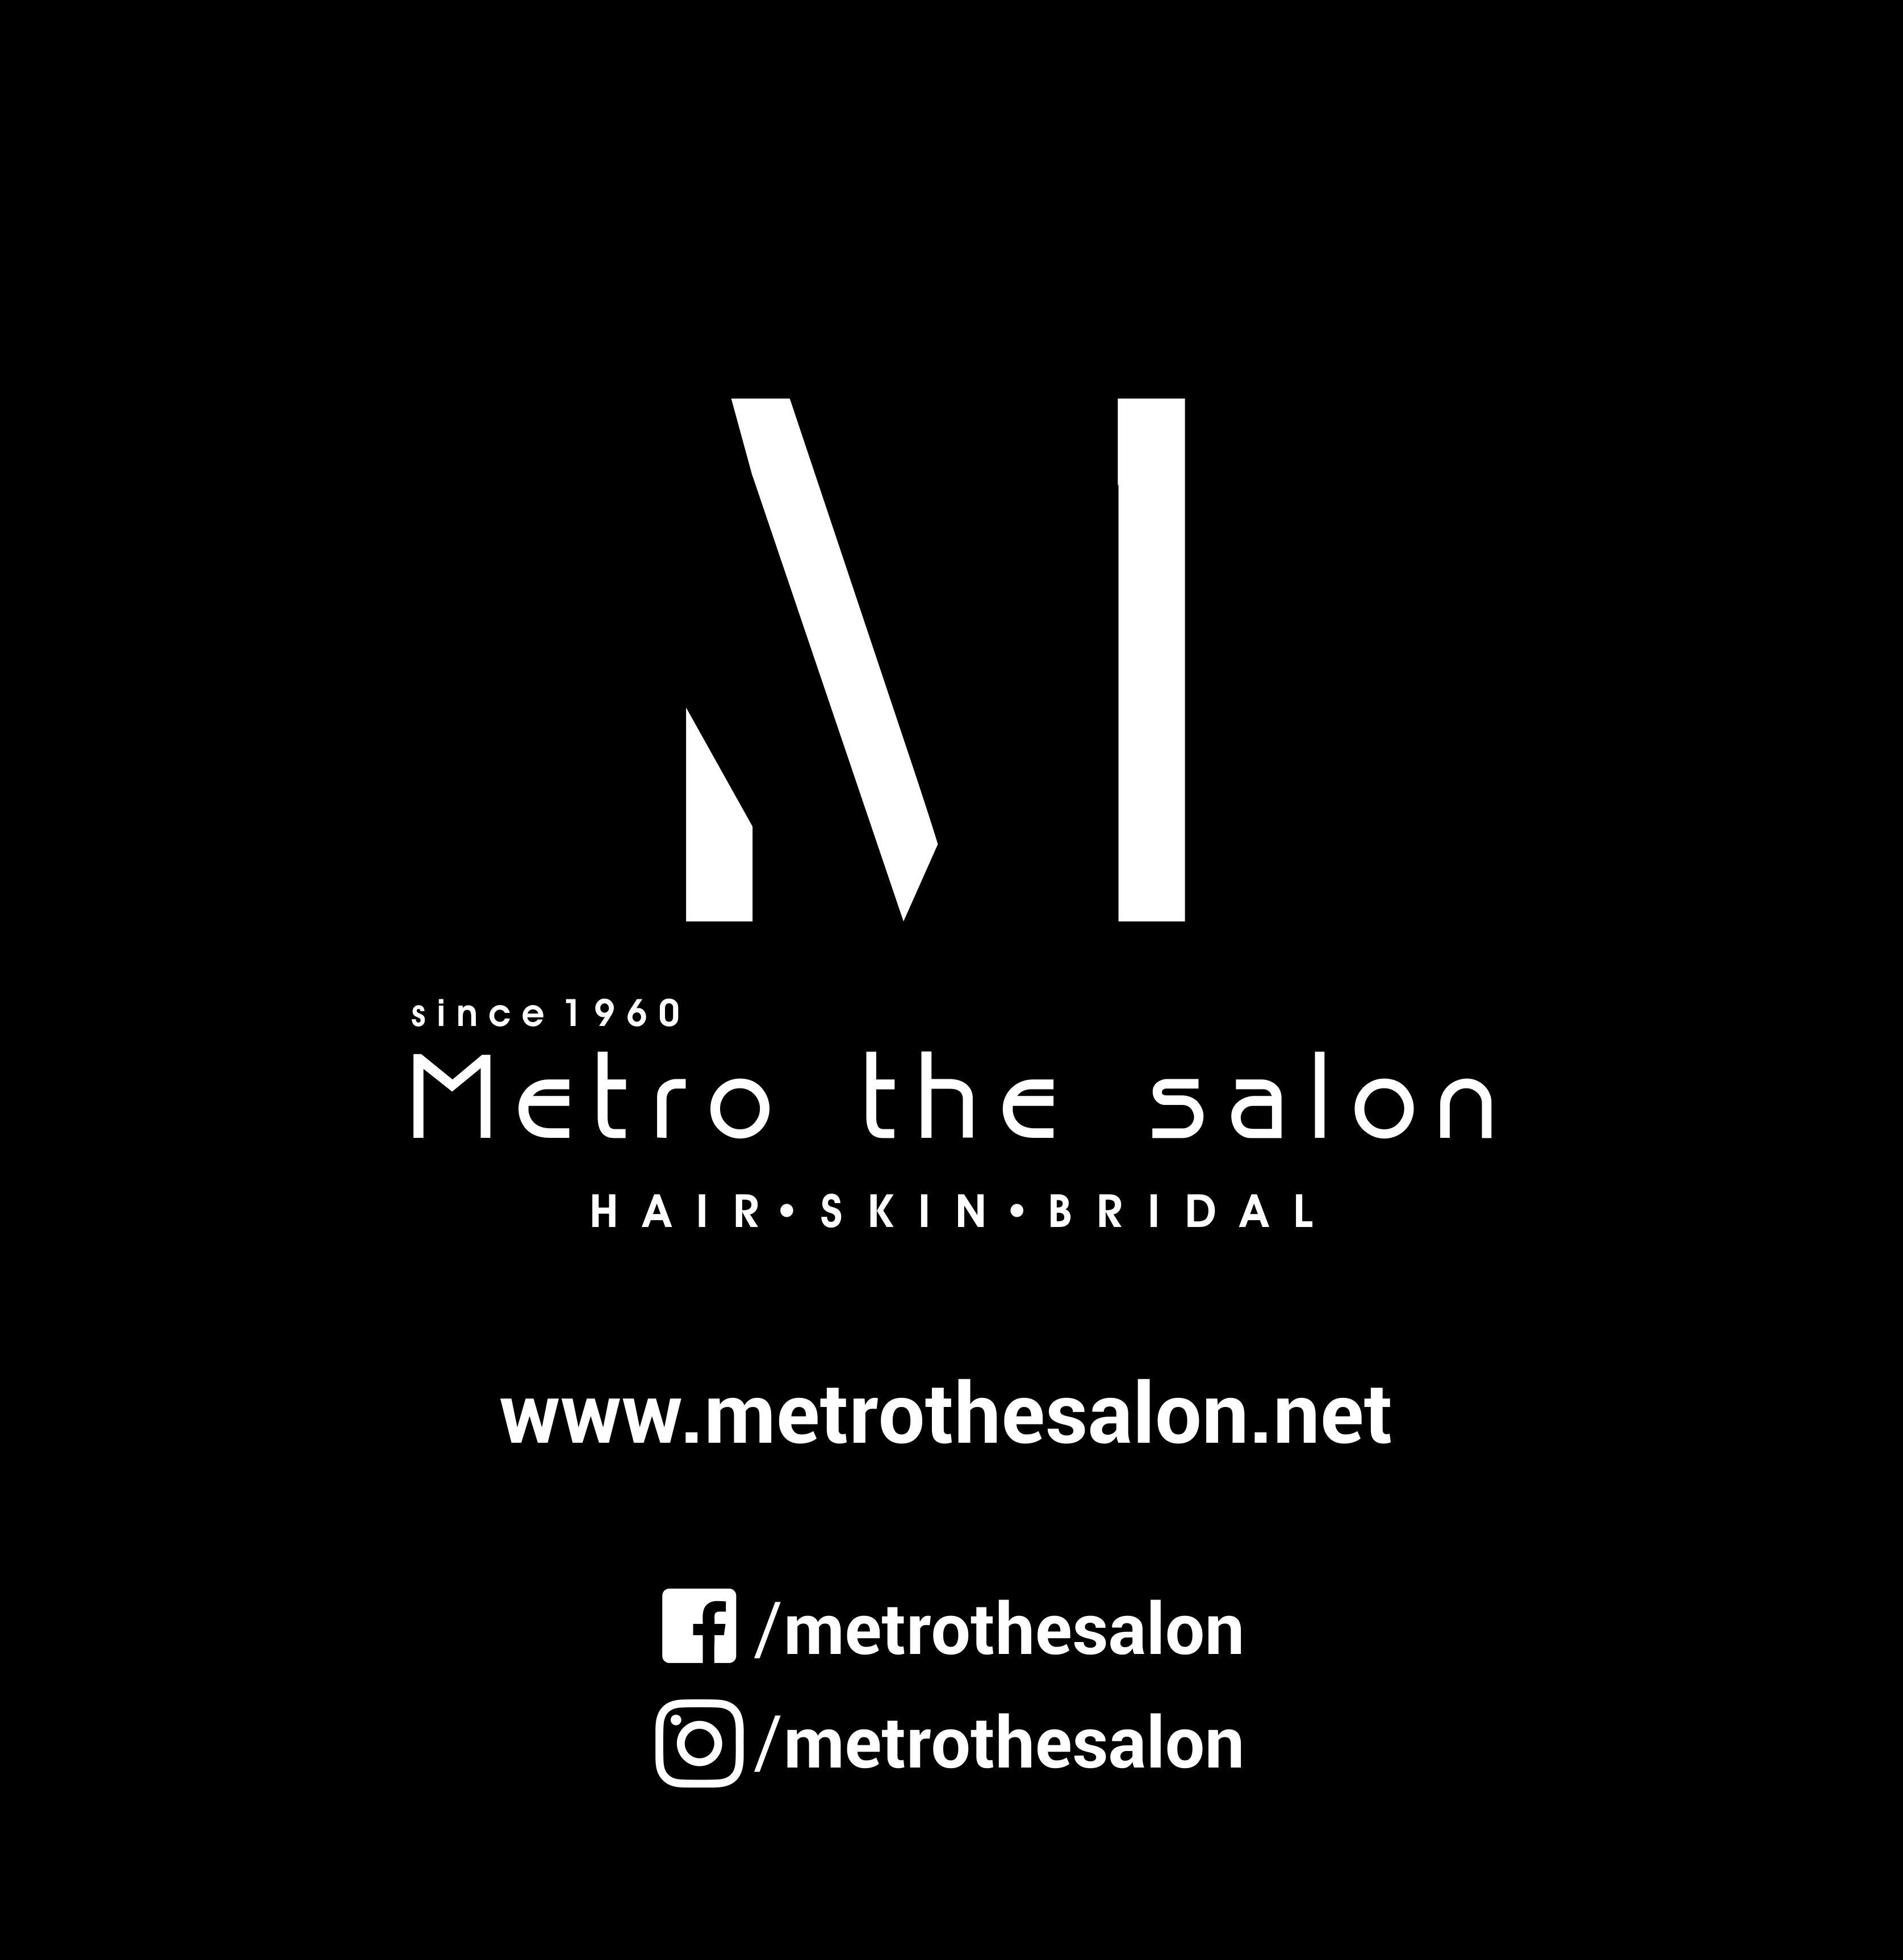 Metro The Salon